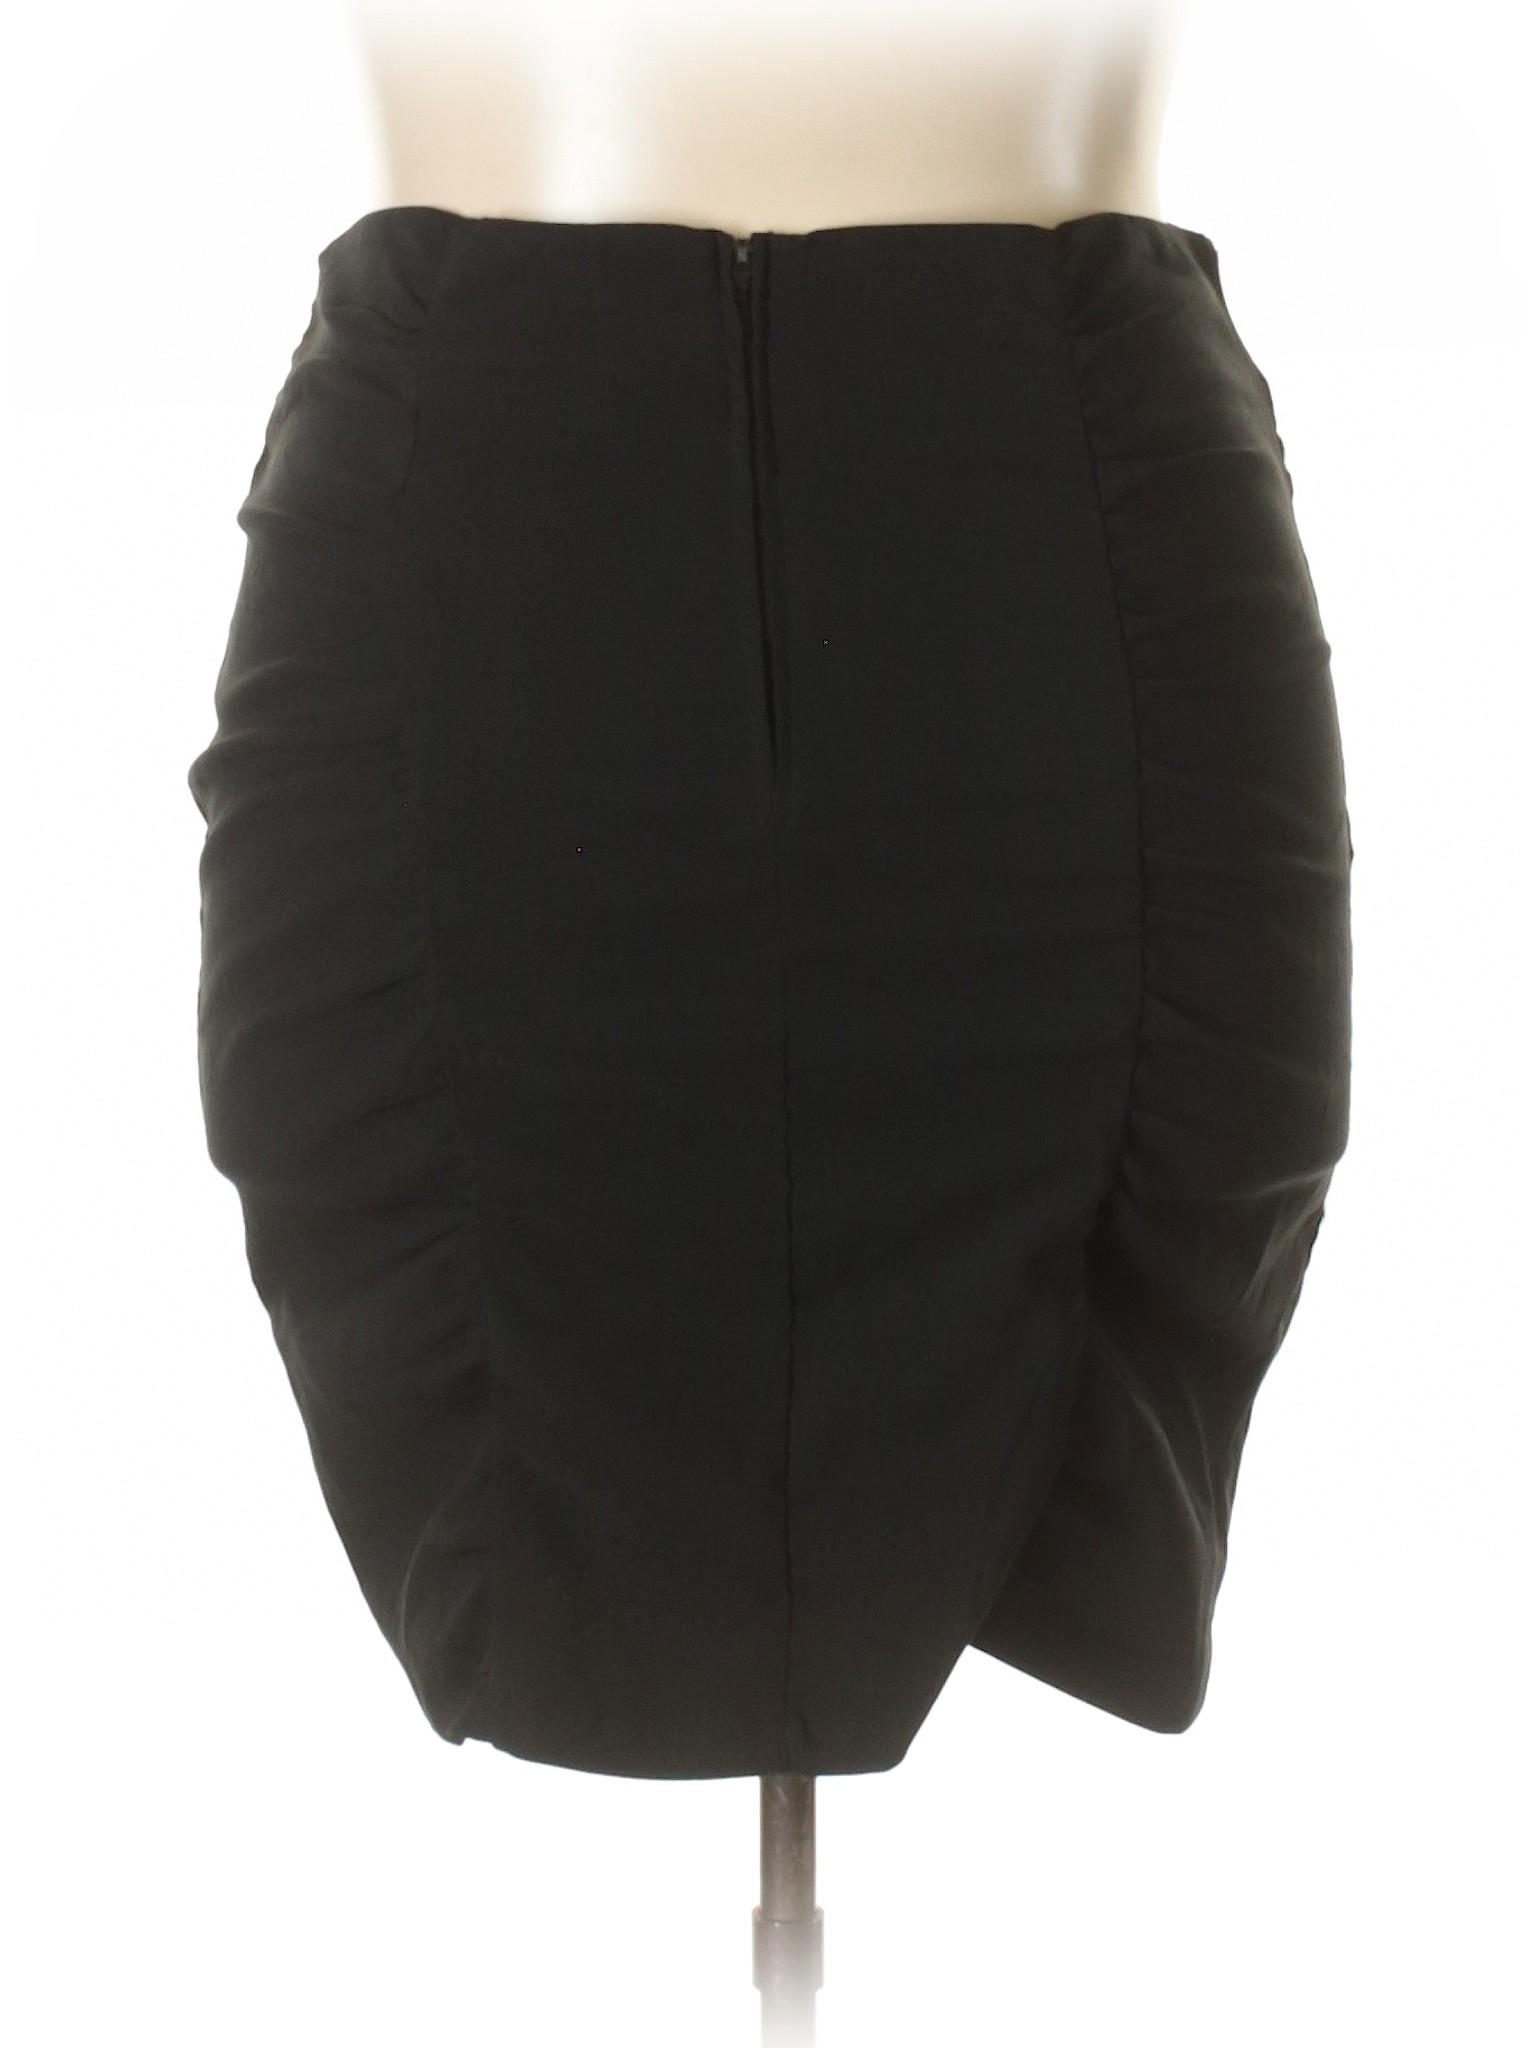 Skirt Skirt Boutique Casual Boutique Boutique Boutique Casual Casual Skirt wqvgRFO